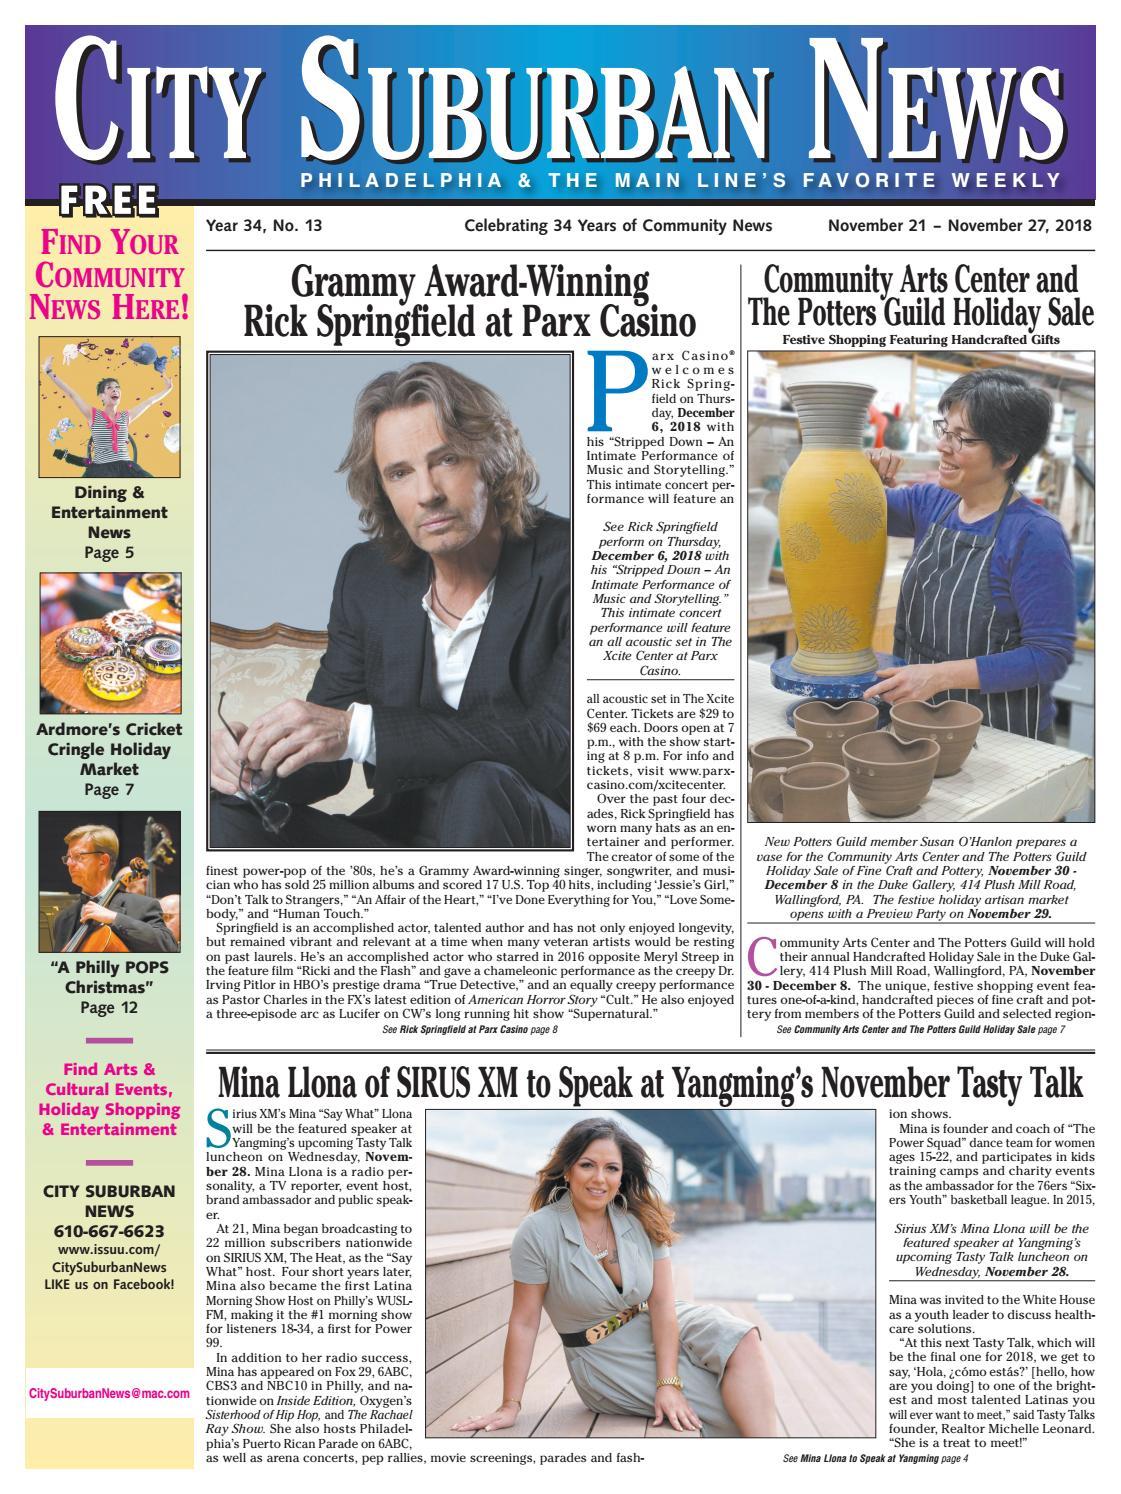 City Suburban News 11_21_18 issue by City Suburban News - issuu